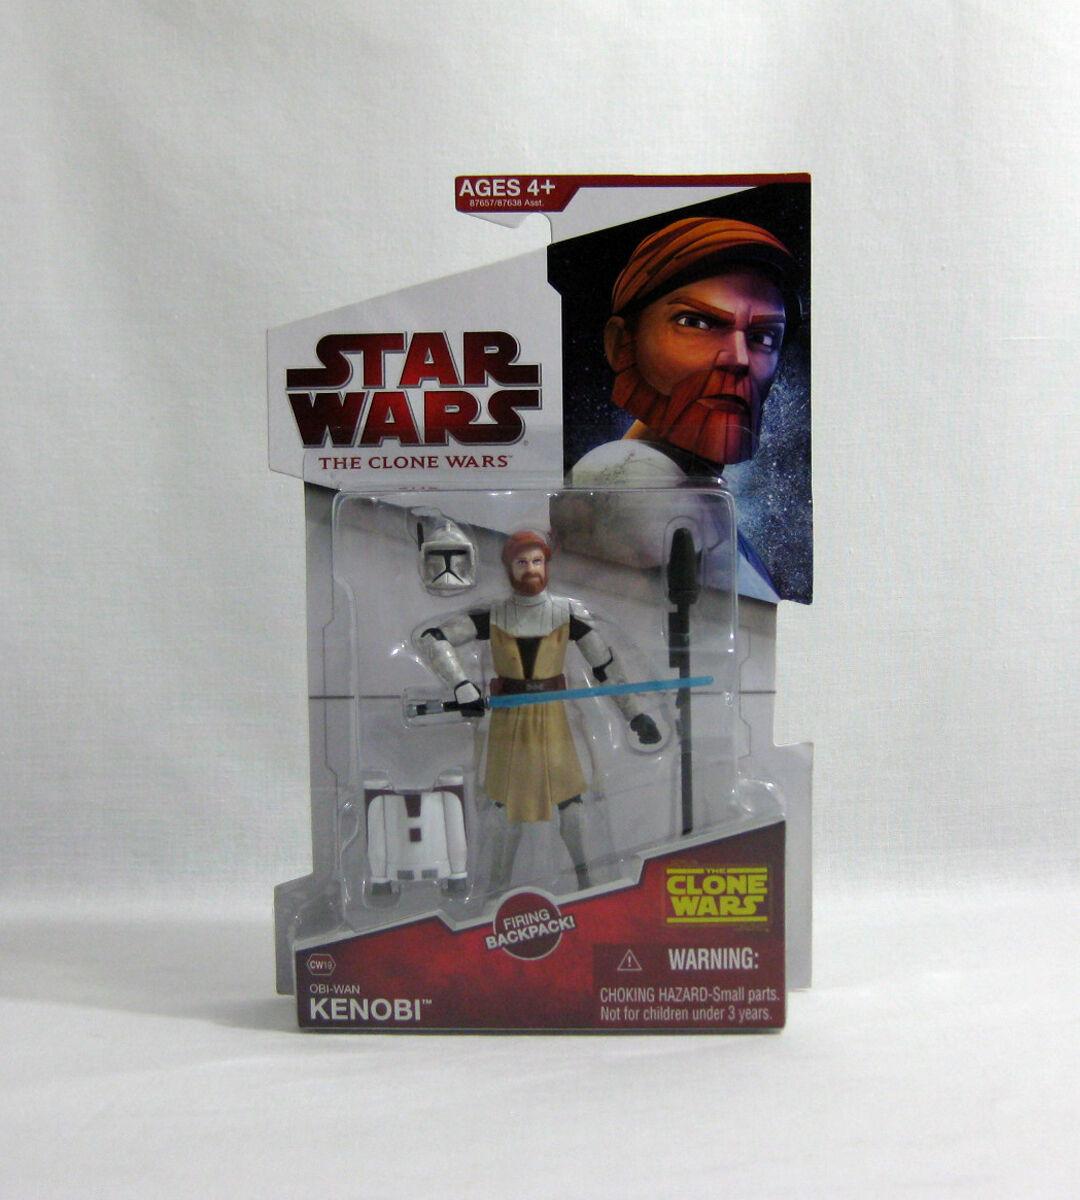 NEW NEW NEW 2009 Star Wars ✧ Obi-Wan Kenobi ✧ Animated Clone Wars CW19 MOC 21e45c